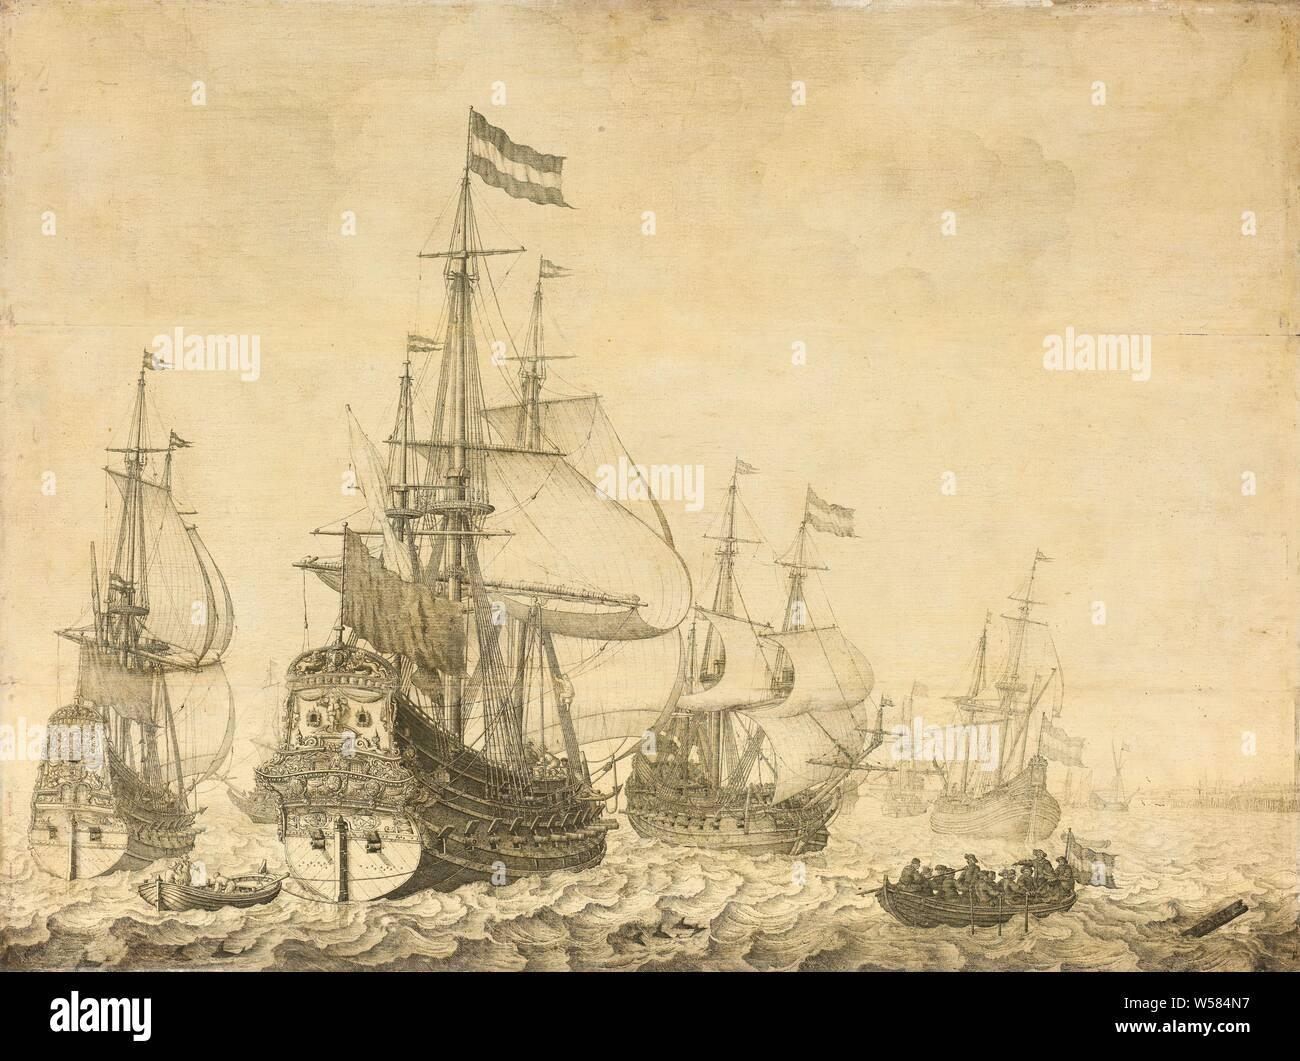 SHIPS LEXINGTON OF THE SEA BATTLE SAILS FLAGS HARPER/'S WEEKLY NAUTICAL ENGRAVING